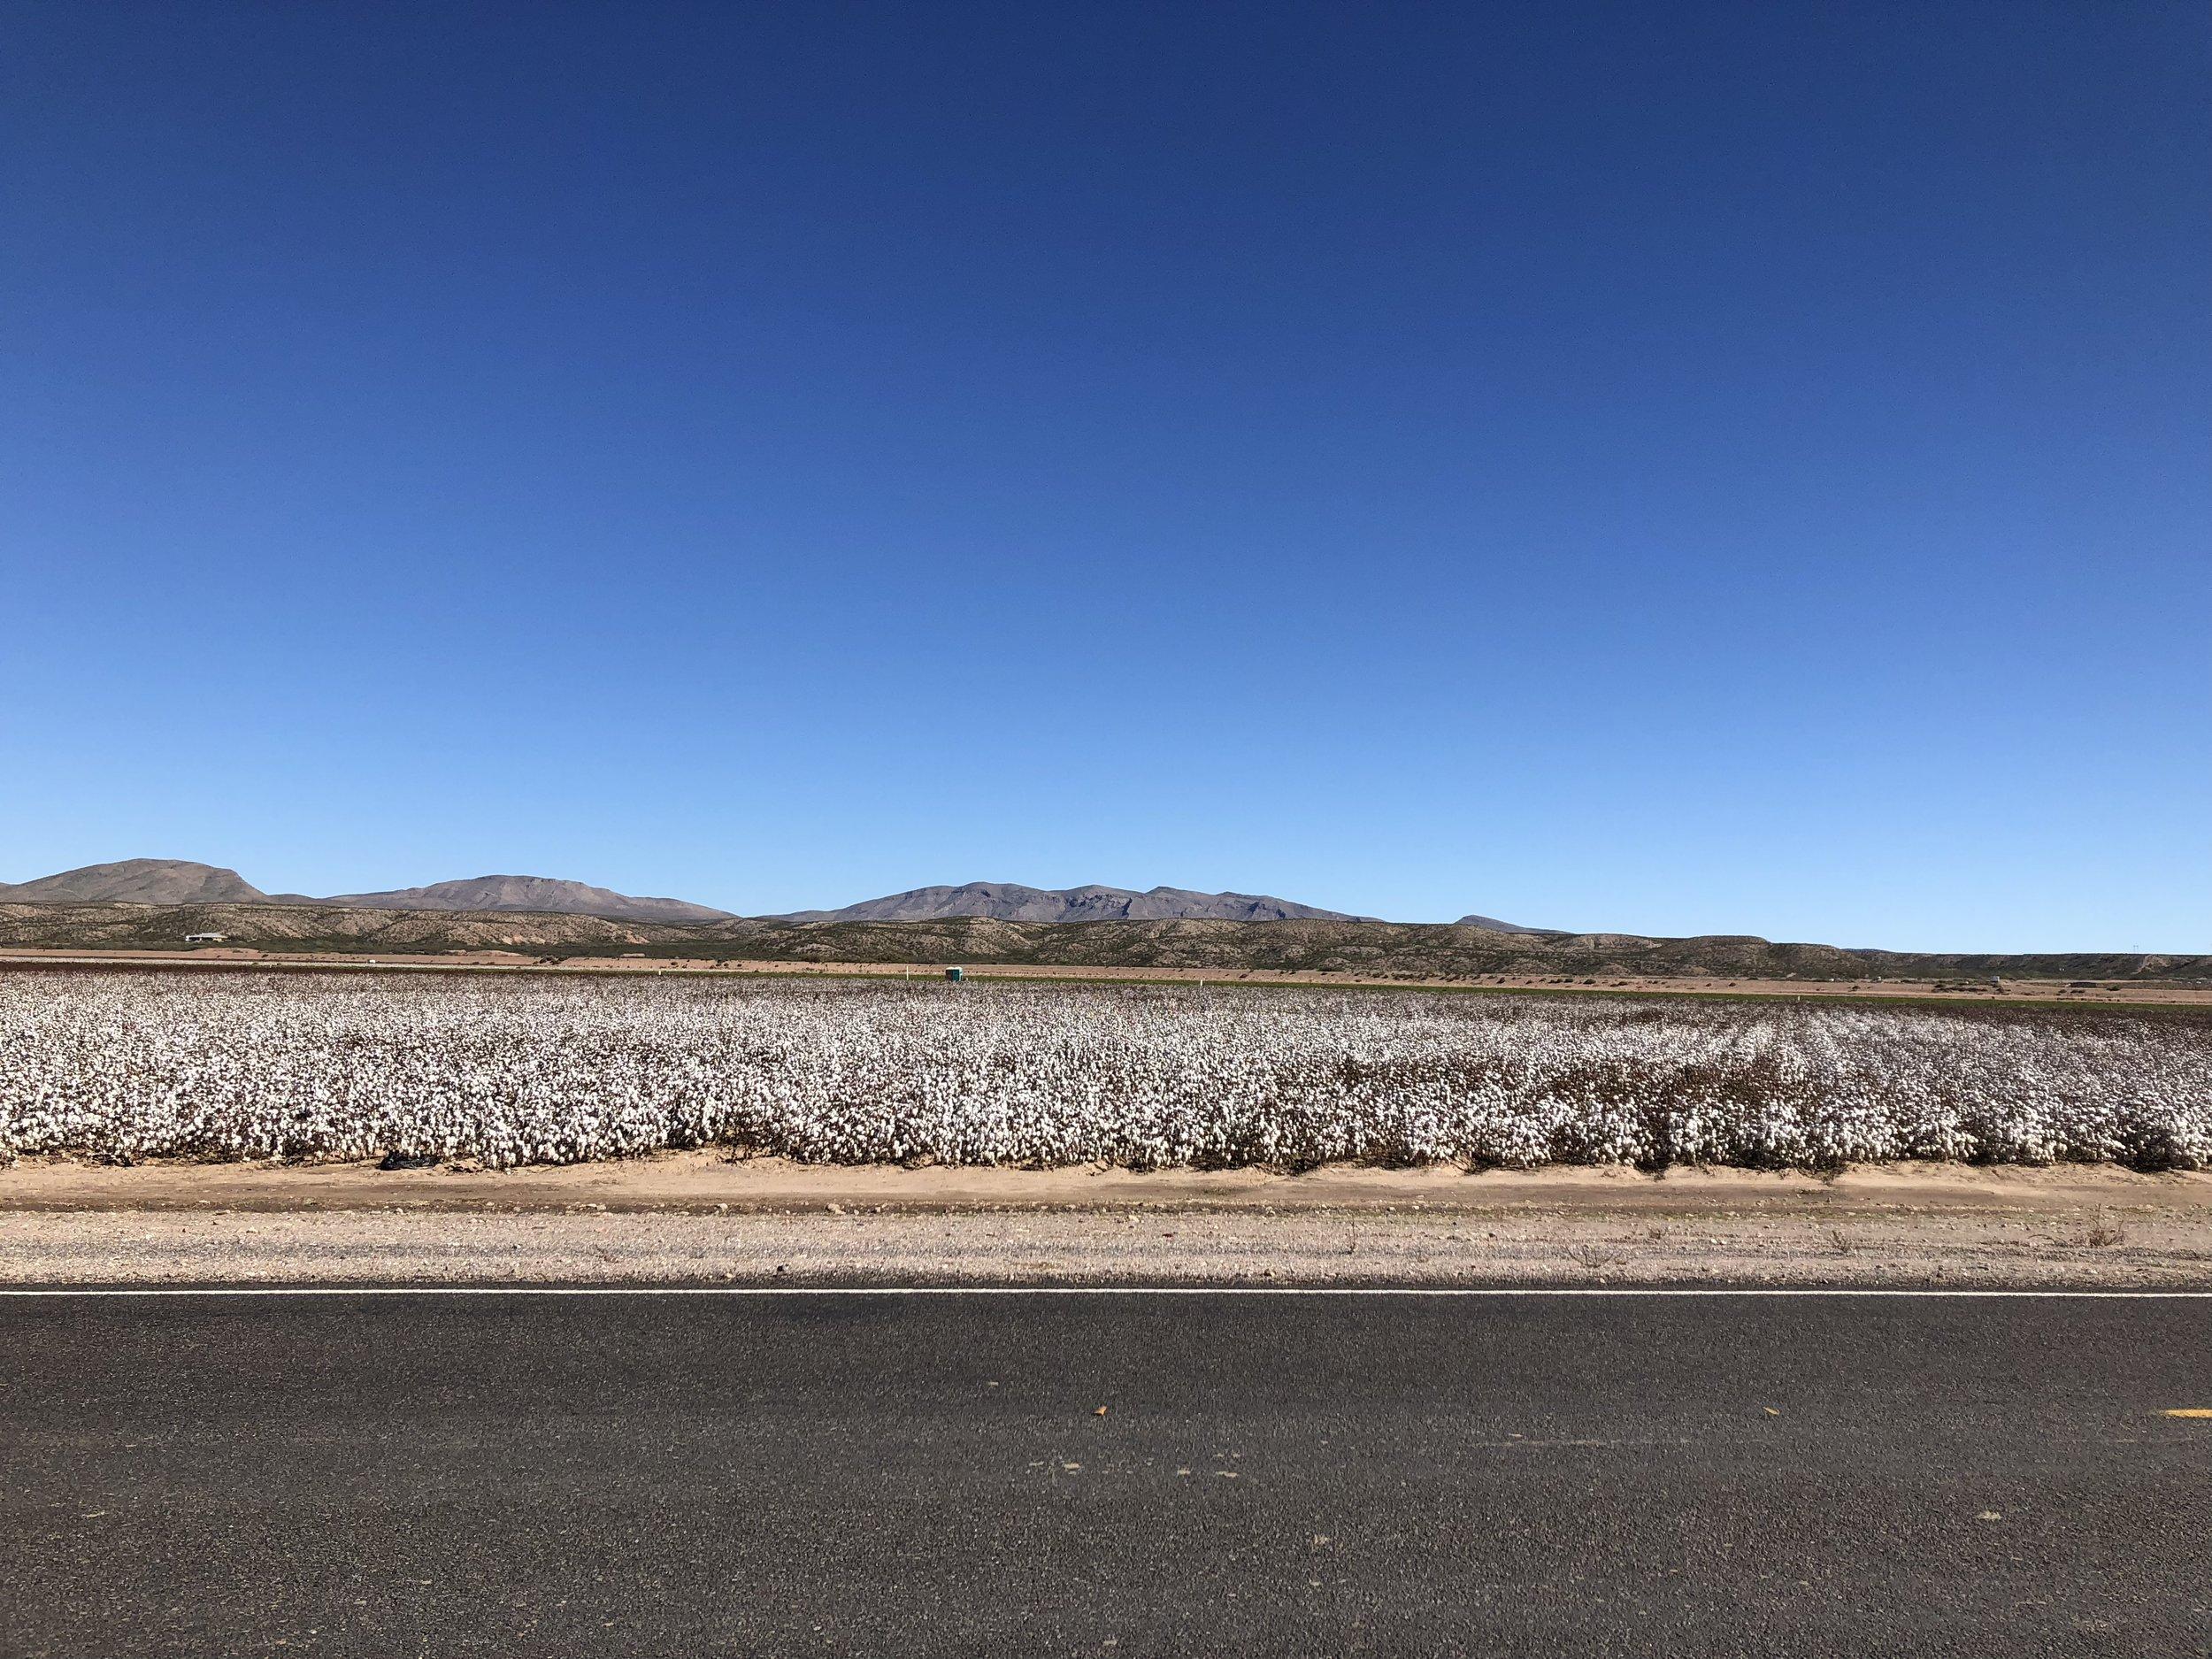 Cotton field (it kinda looks like it just snowed).